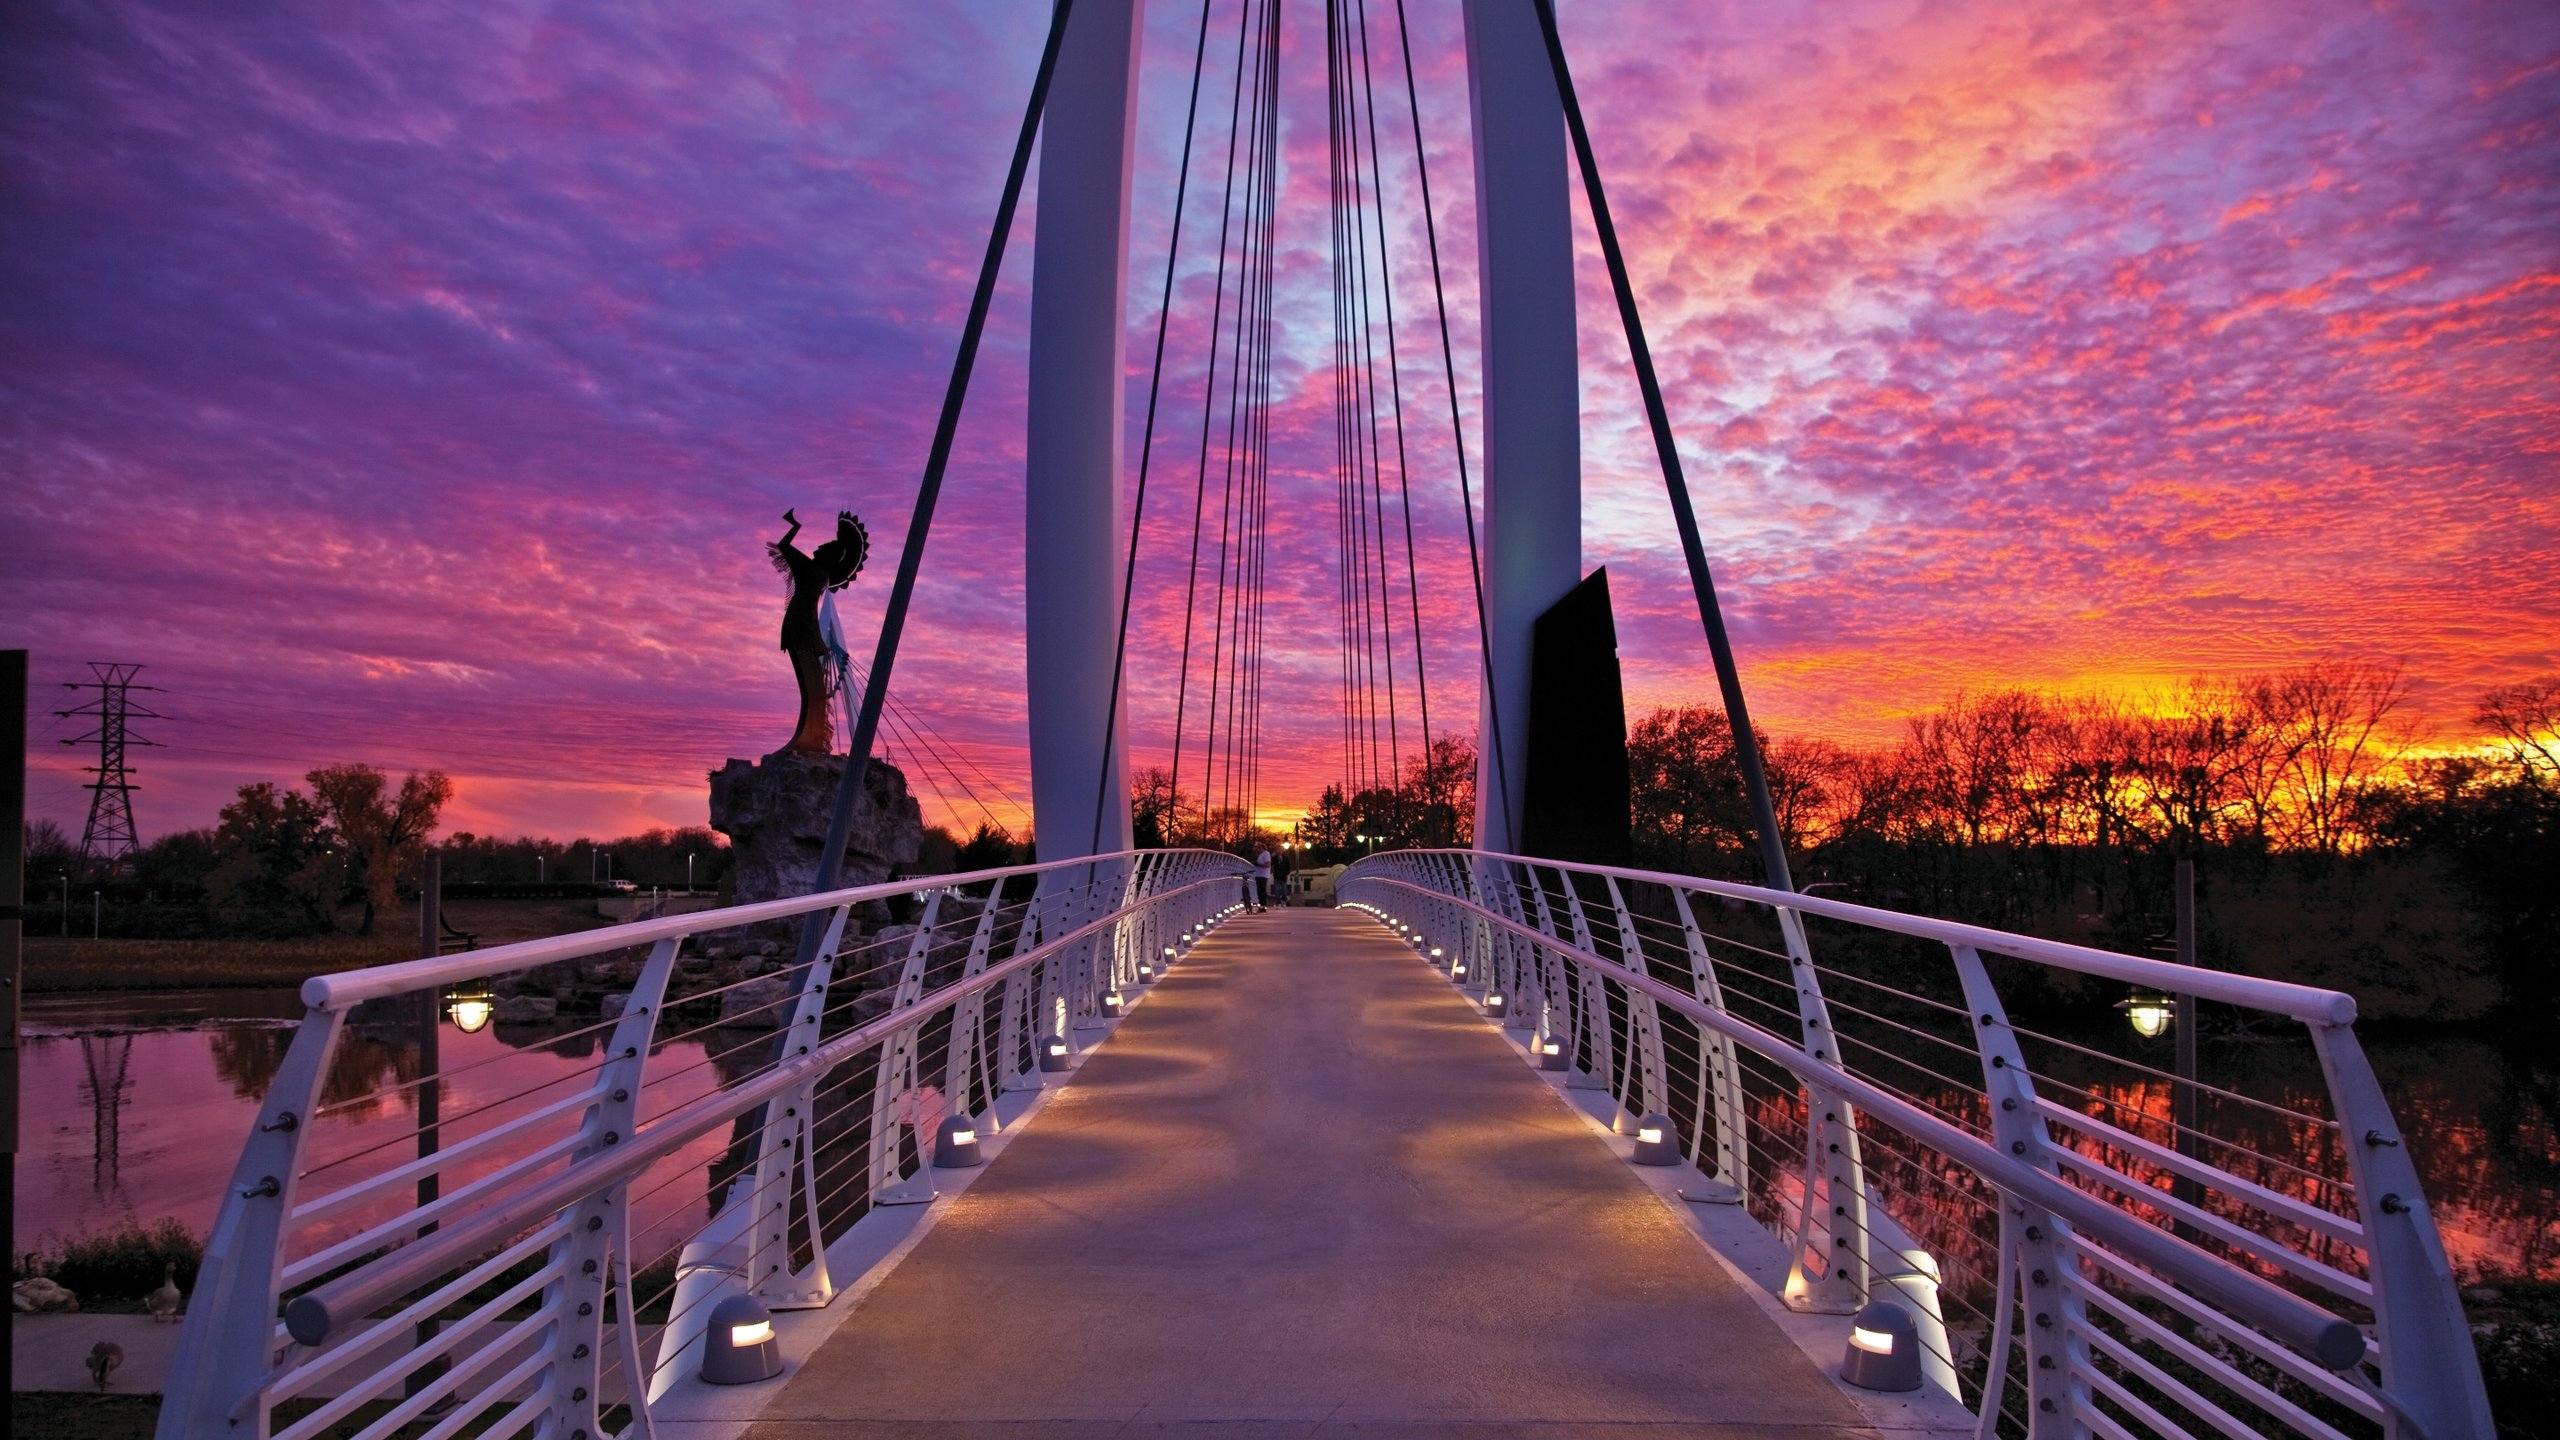 Sedgwick County, Kansas, United States of America